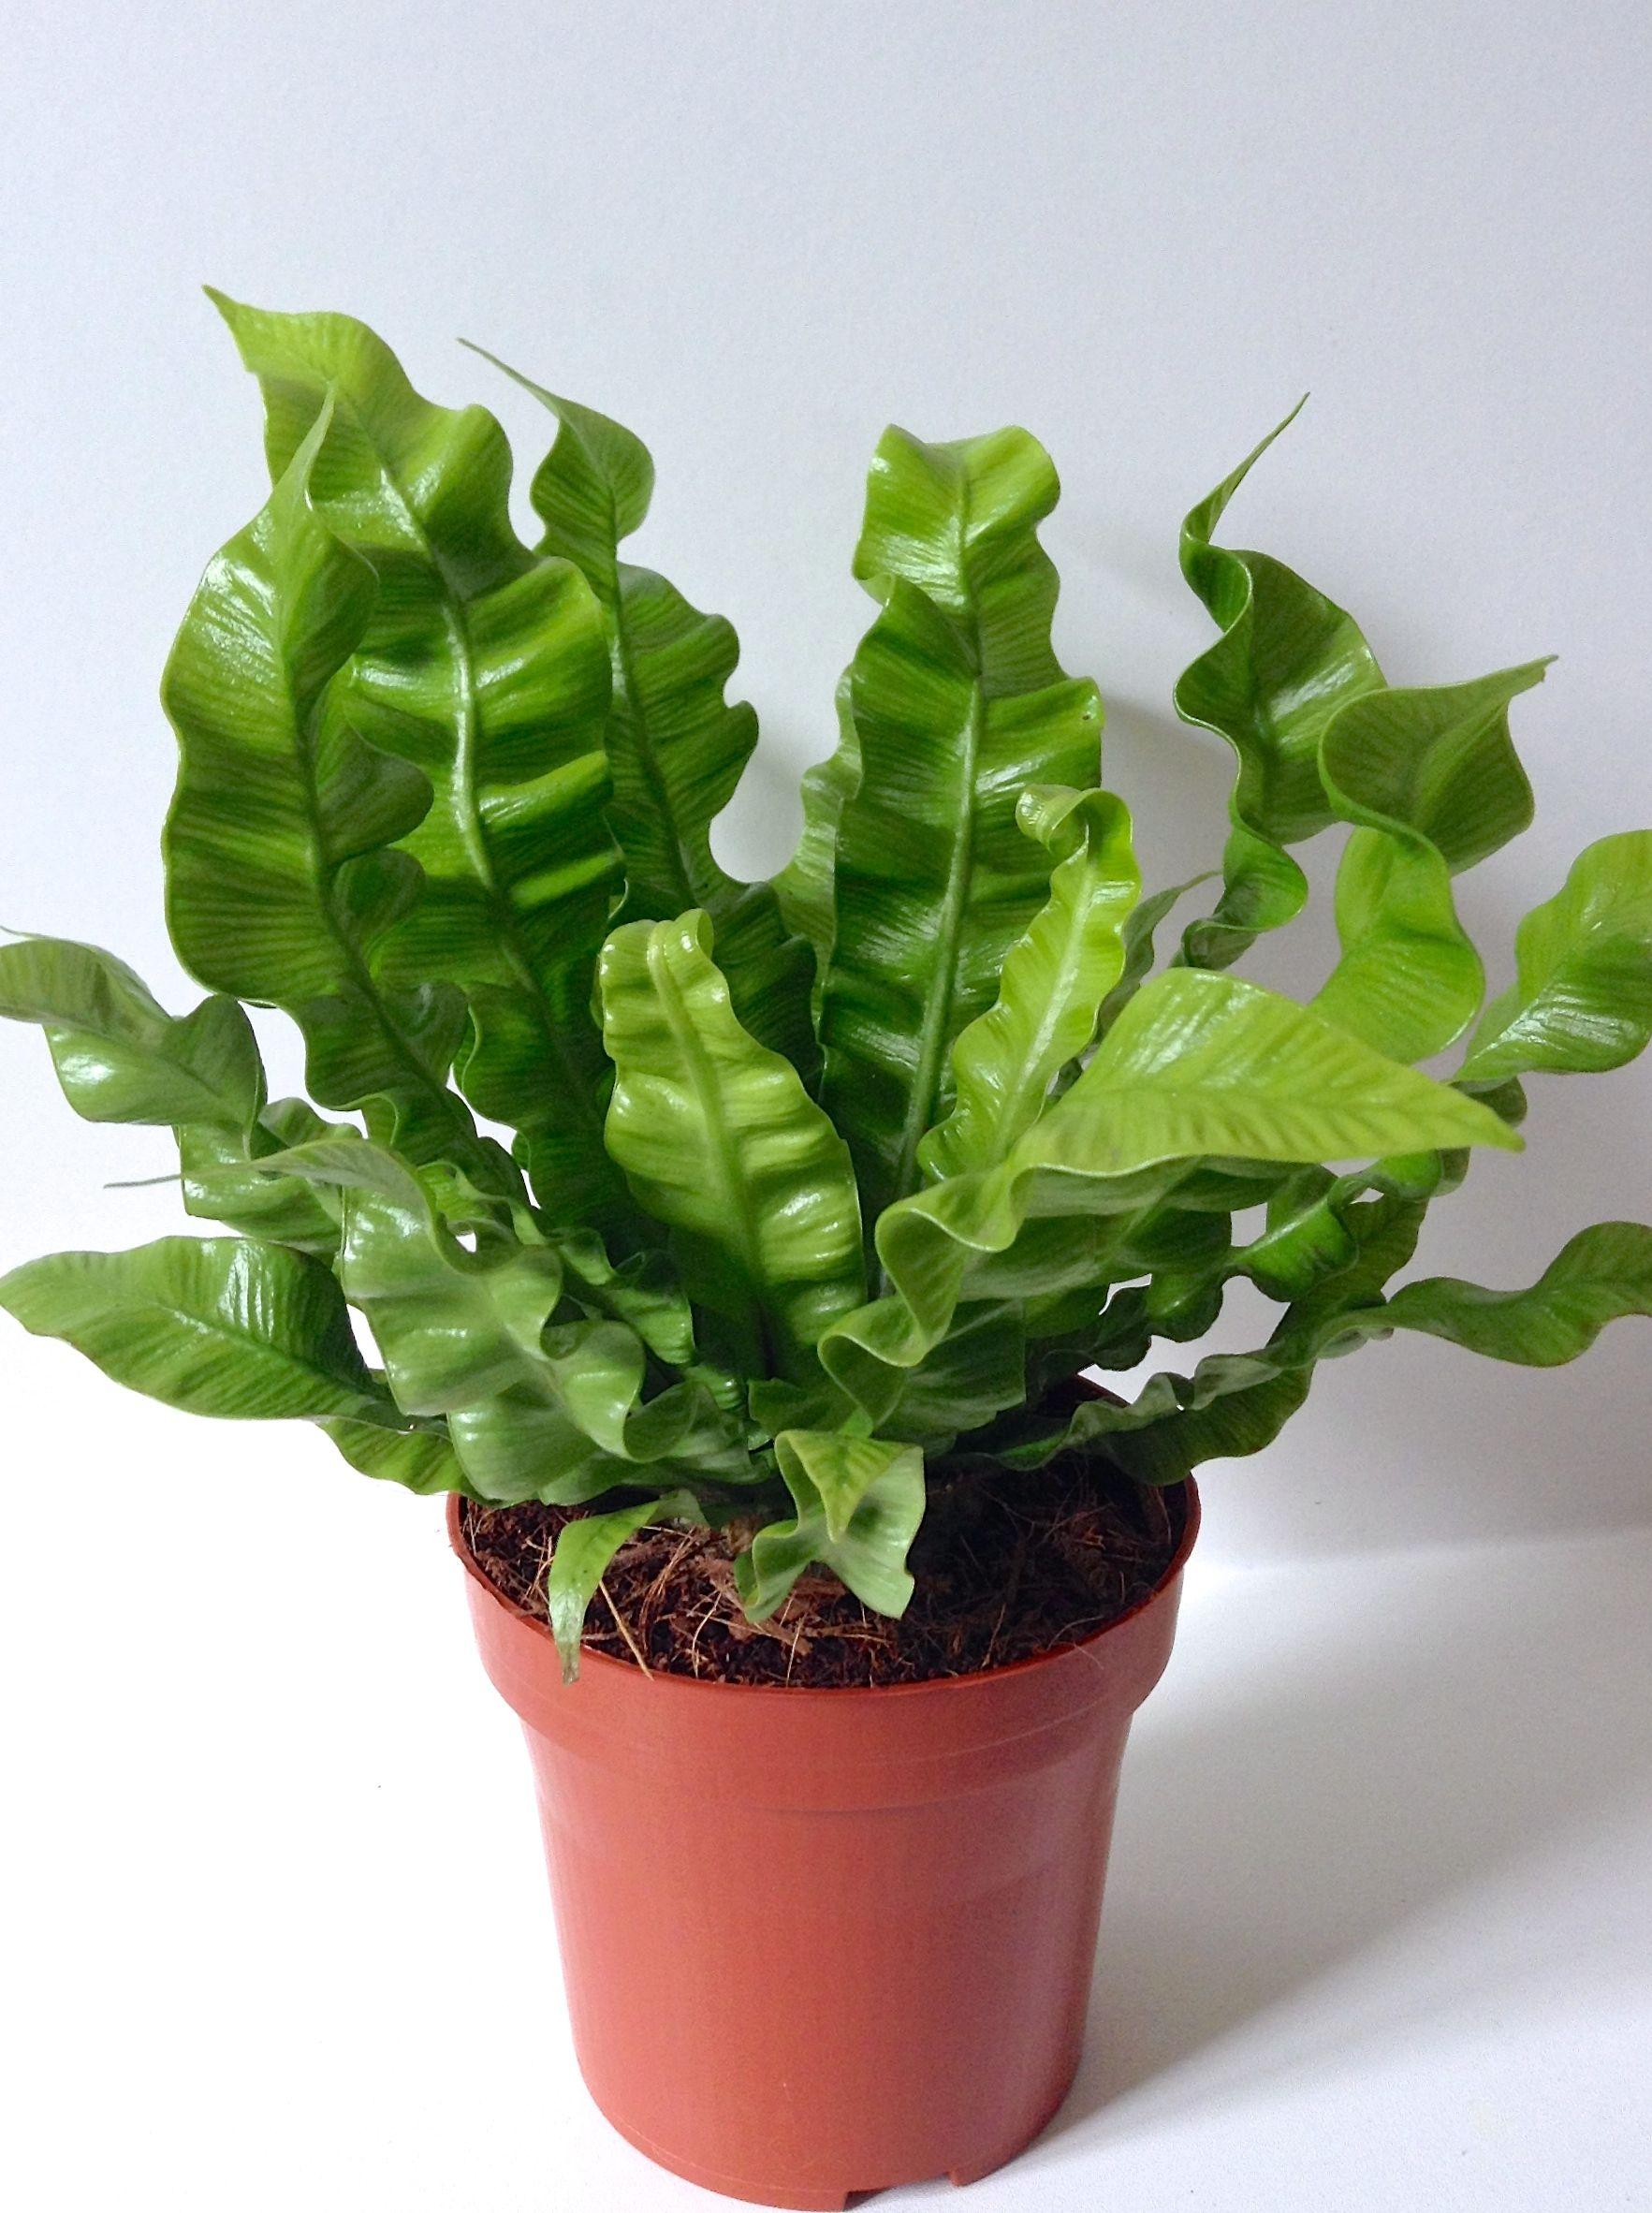 Best Kitchen Gallery: Asplenium Nidus Lasagna Fern Interiorscape Plants Id of House Plant Identifier By Leaf on rachelxblog.com